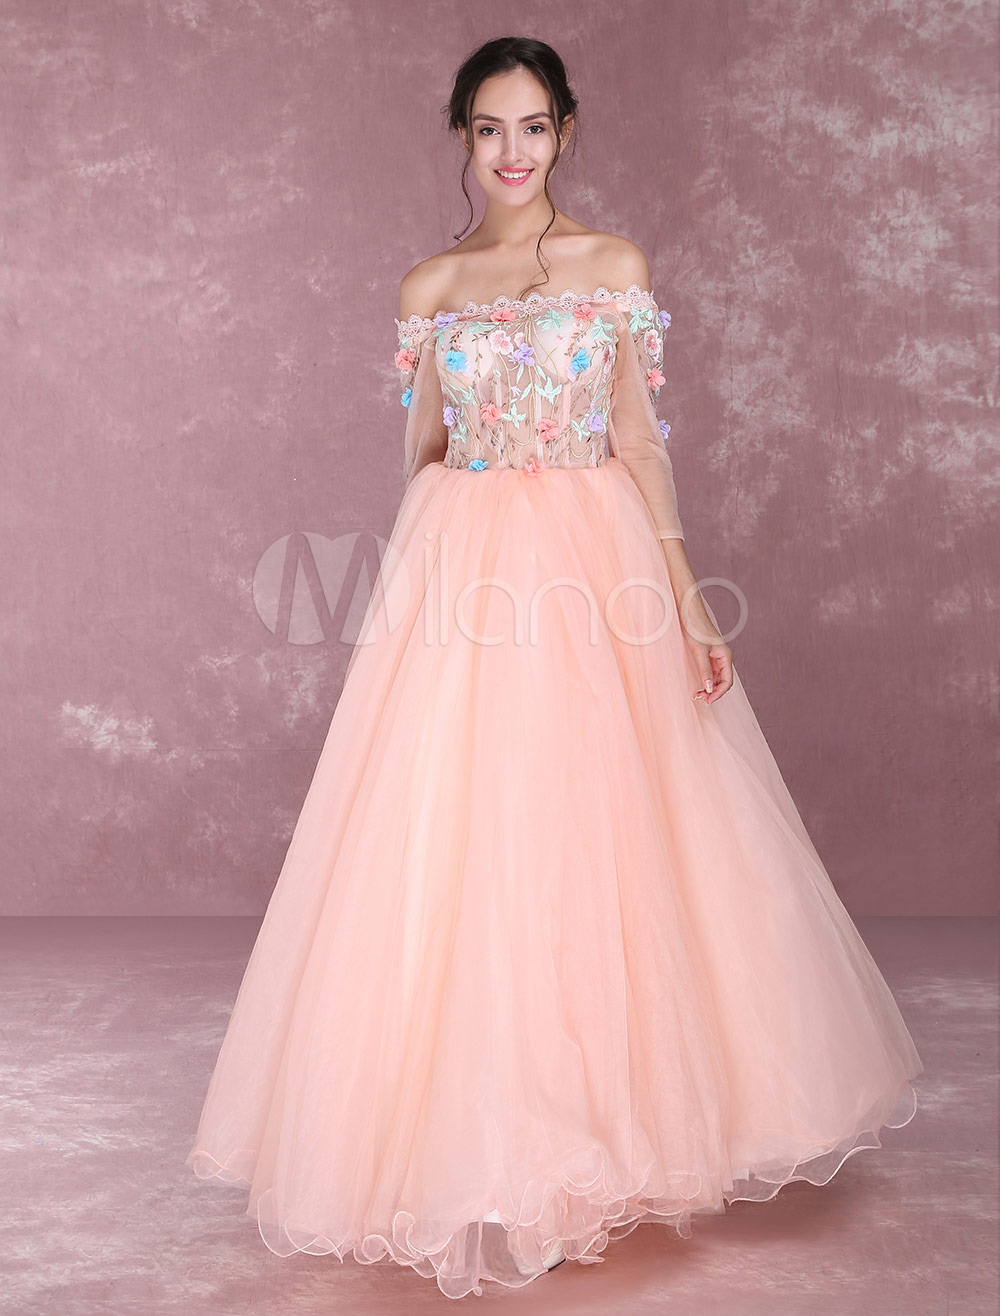 cb1f78039114 ... Shoulder Prom Dresses Flowers Applique Floor Length Pageant Dress-. 12.  32%OFF. Color Orange